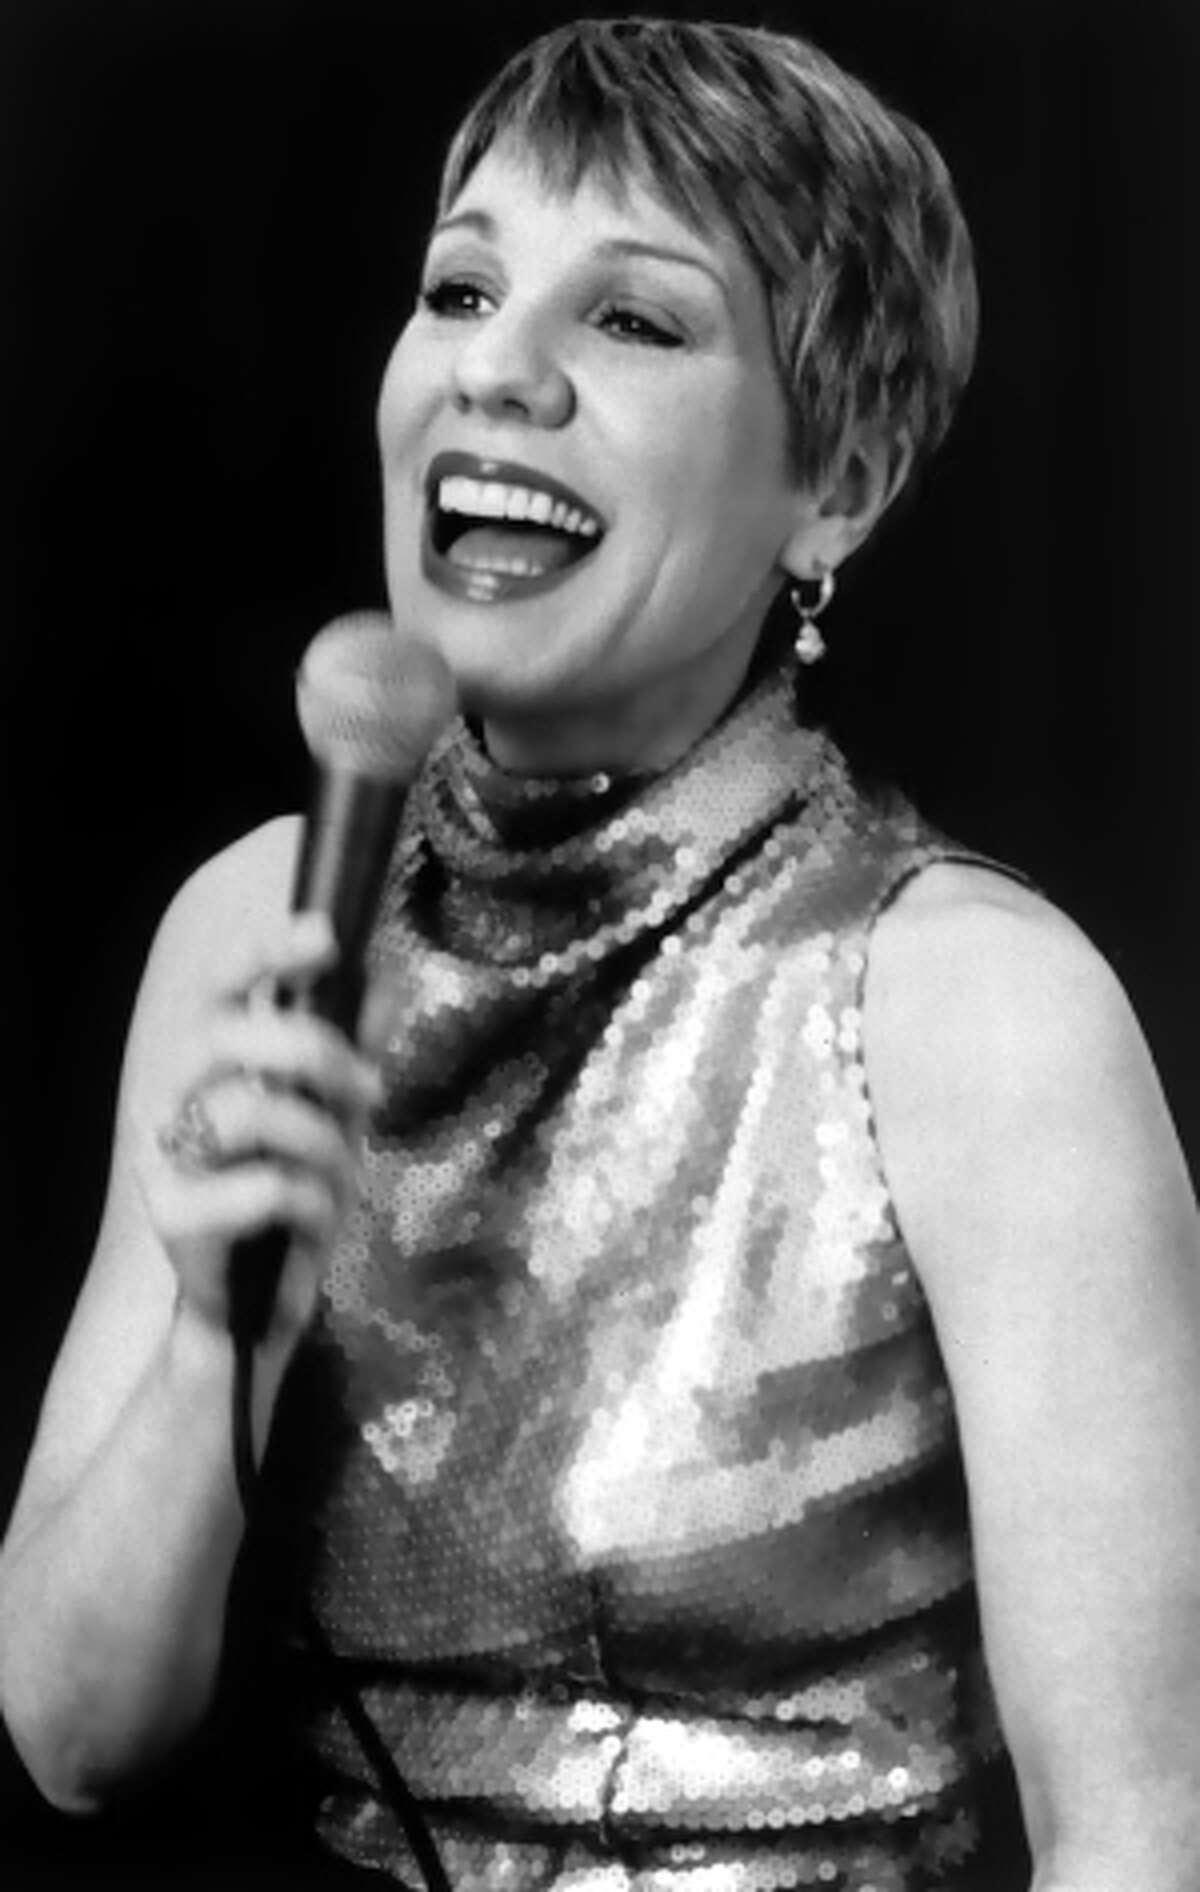 Undated B&W photo of jazz vocalist Susannah McCorkle from WEB.